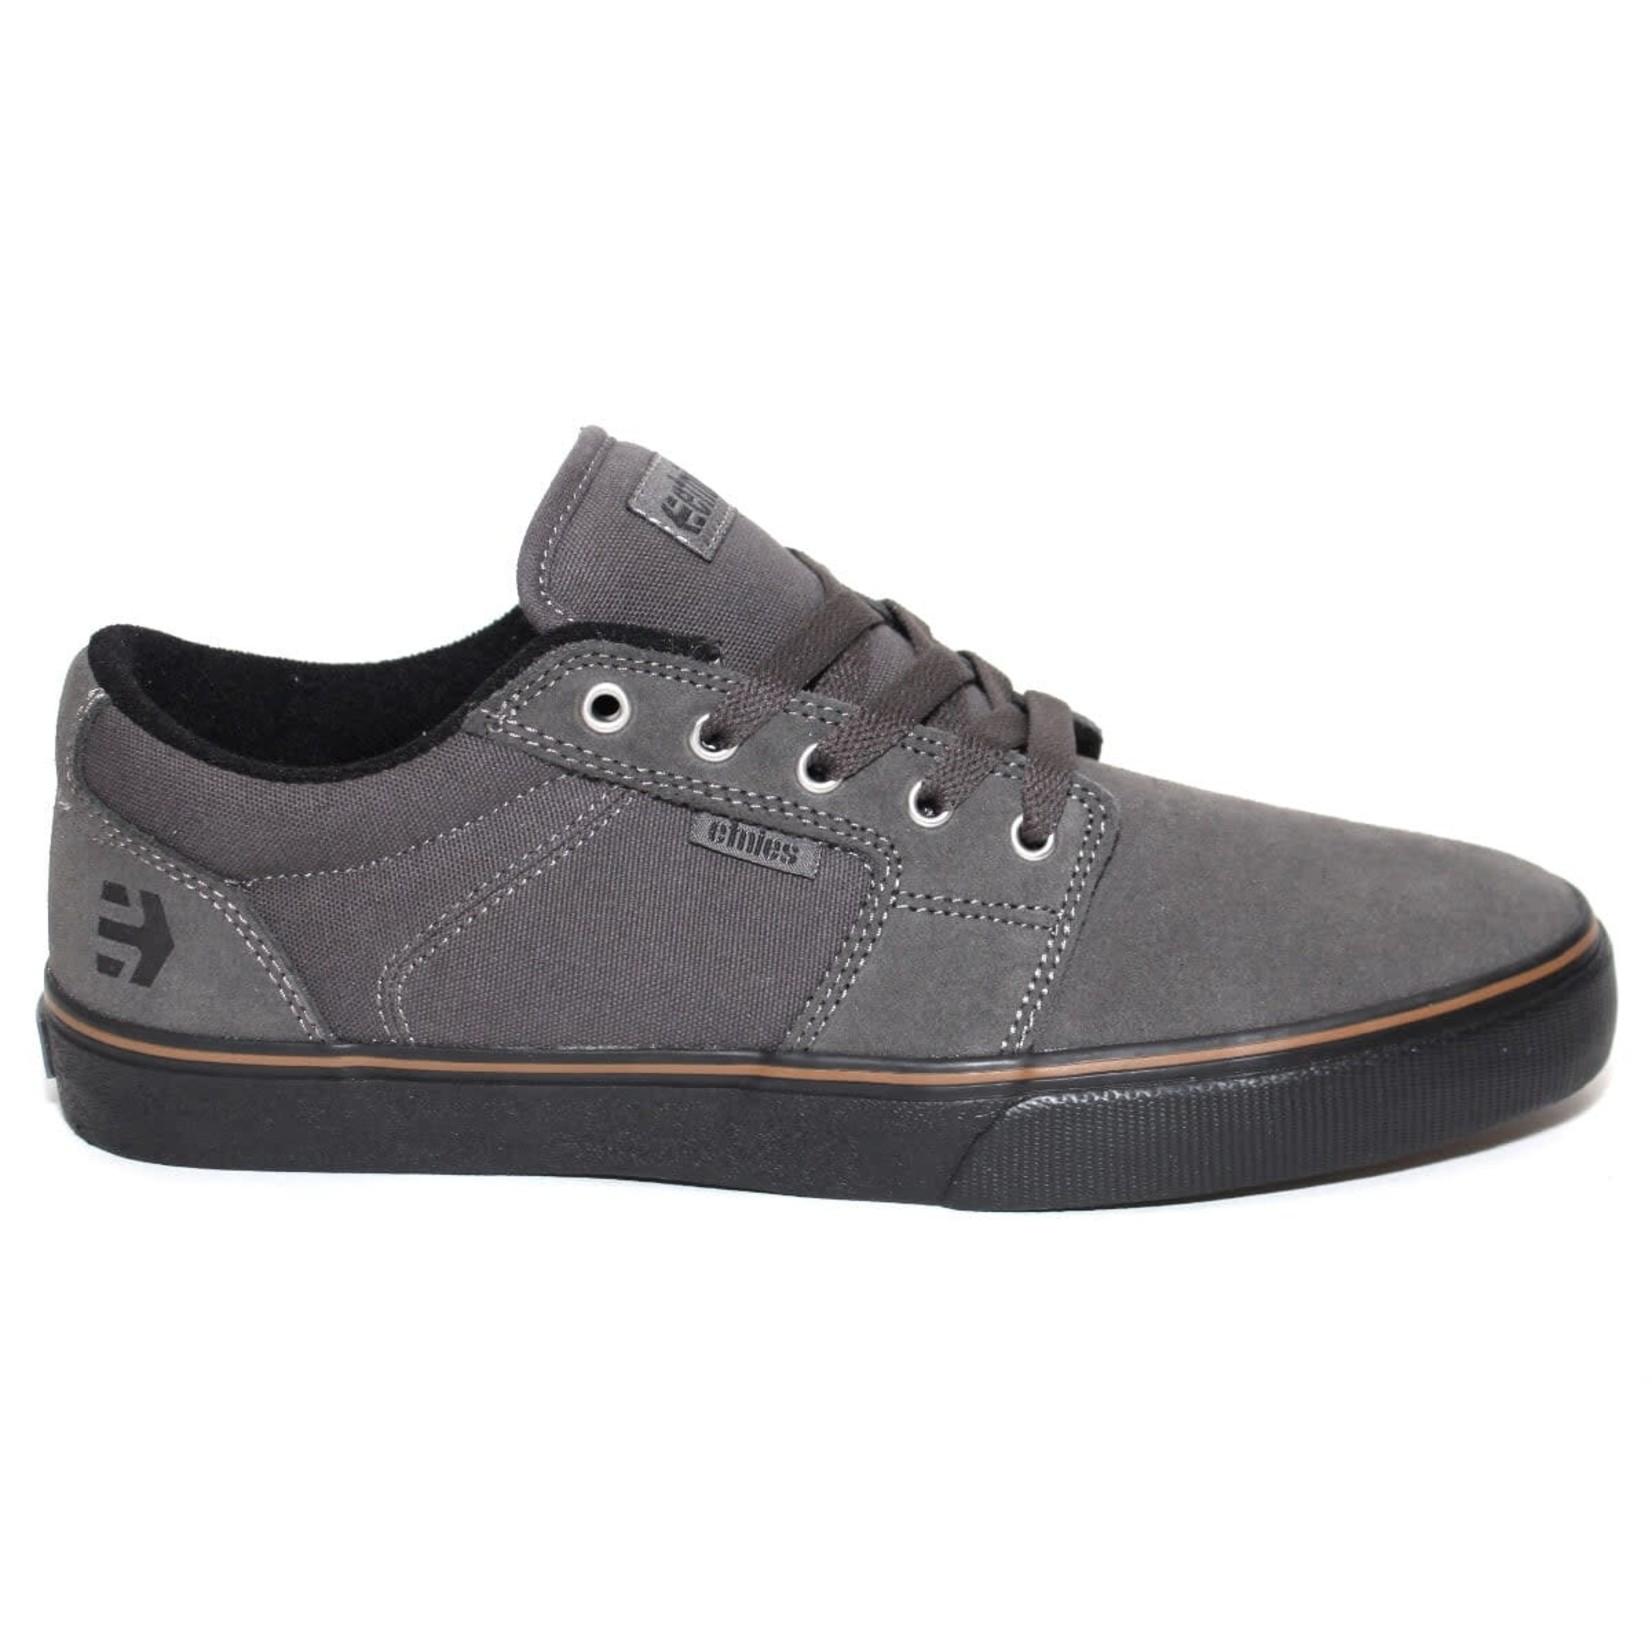 Etnies Etnies Casual Shoes, Barge LS, Mens